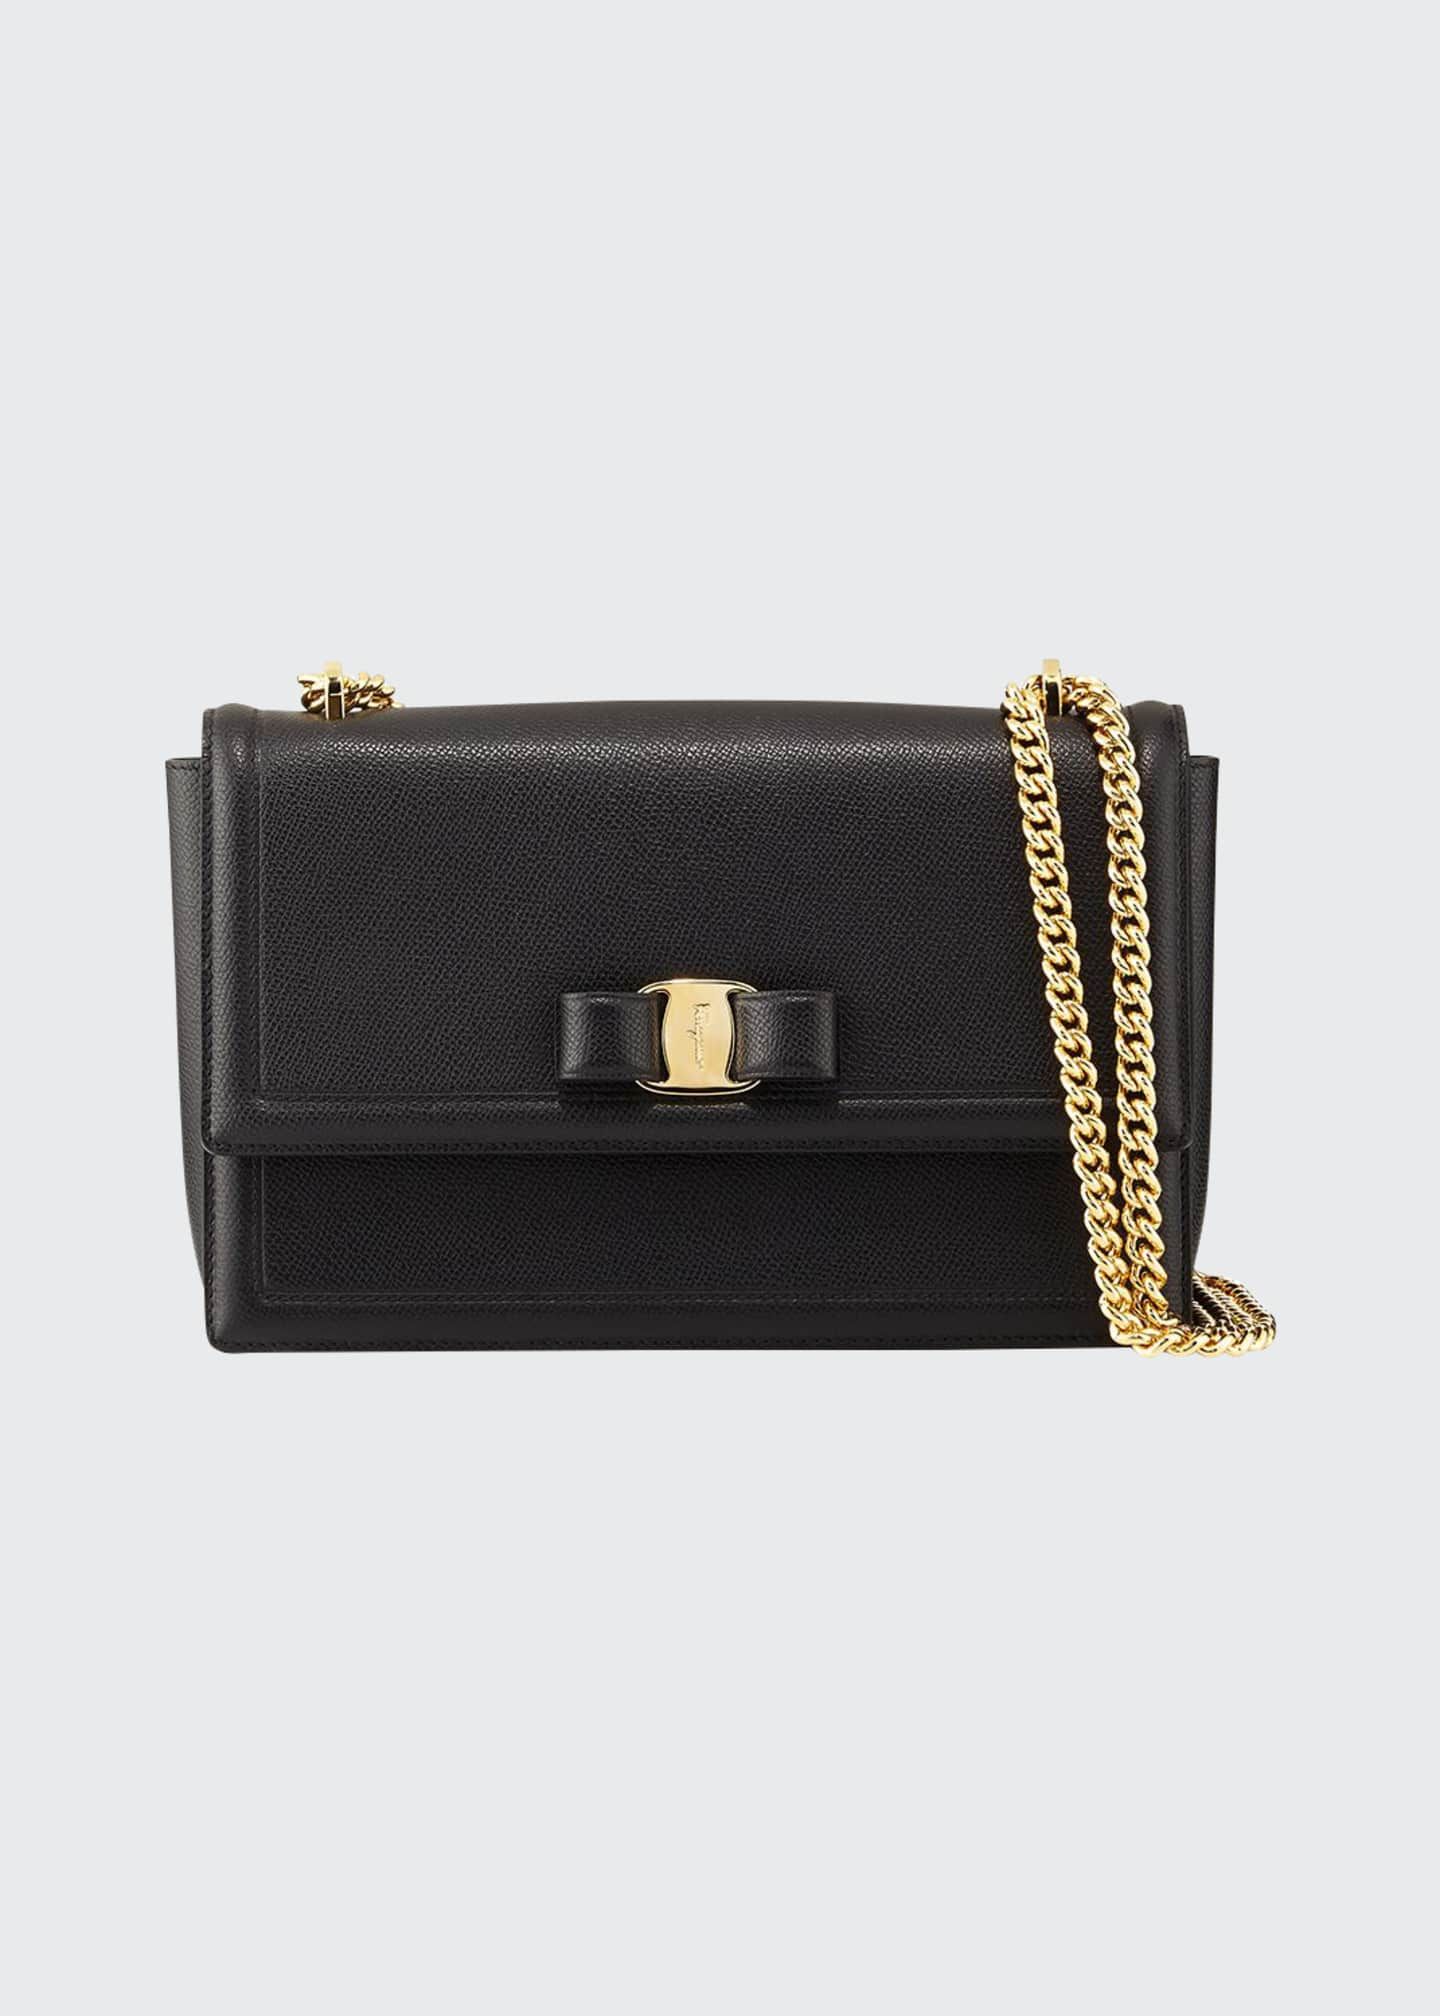 Salvatore Ferragamo Ginny Medium Vara Crossbody Bag, Black